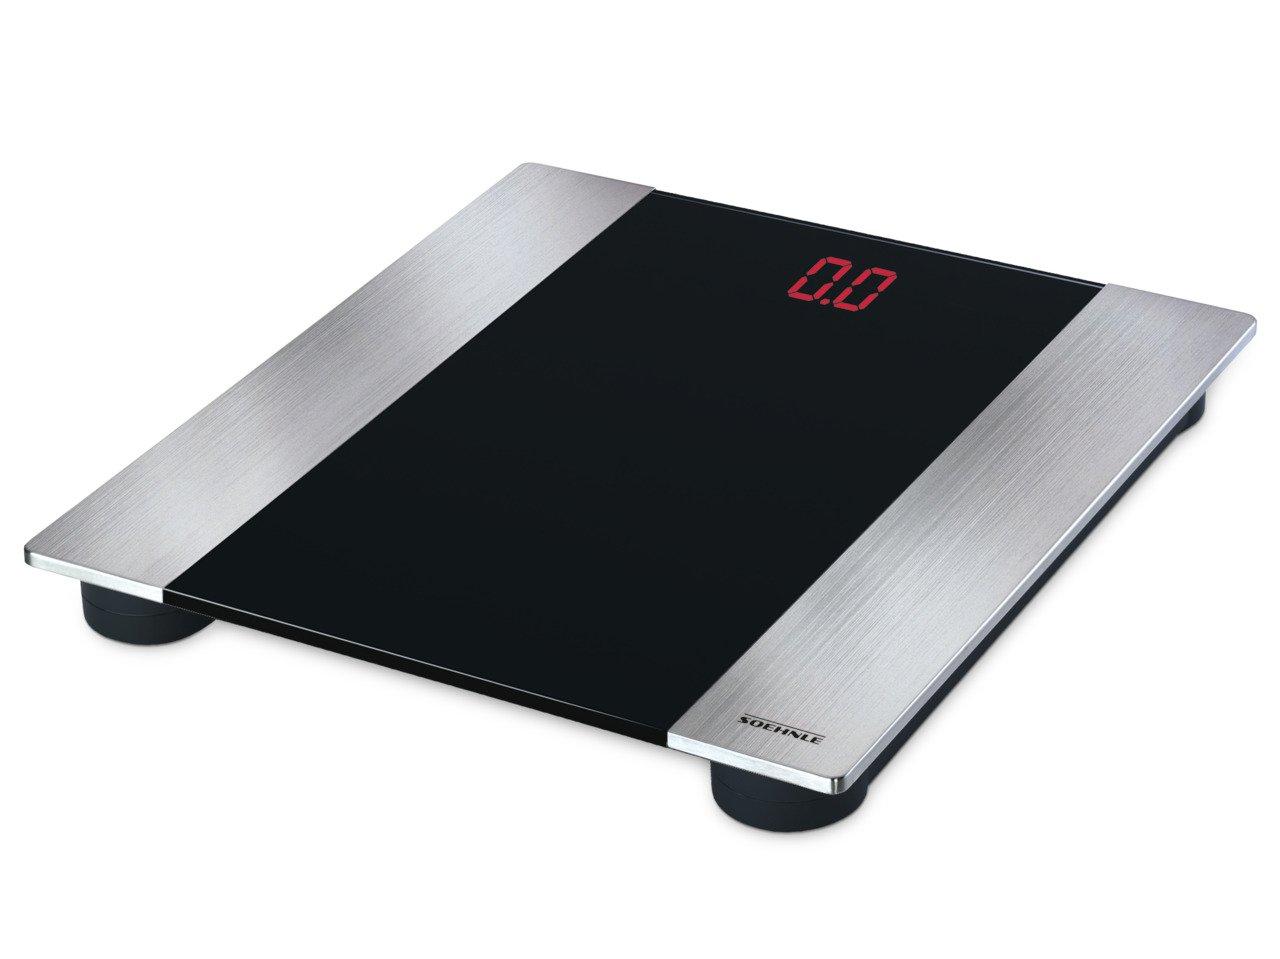 Soehnle 63536 Linea Digital Bath Scale, Silver/Black